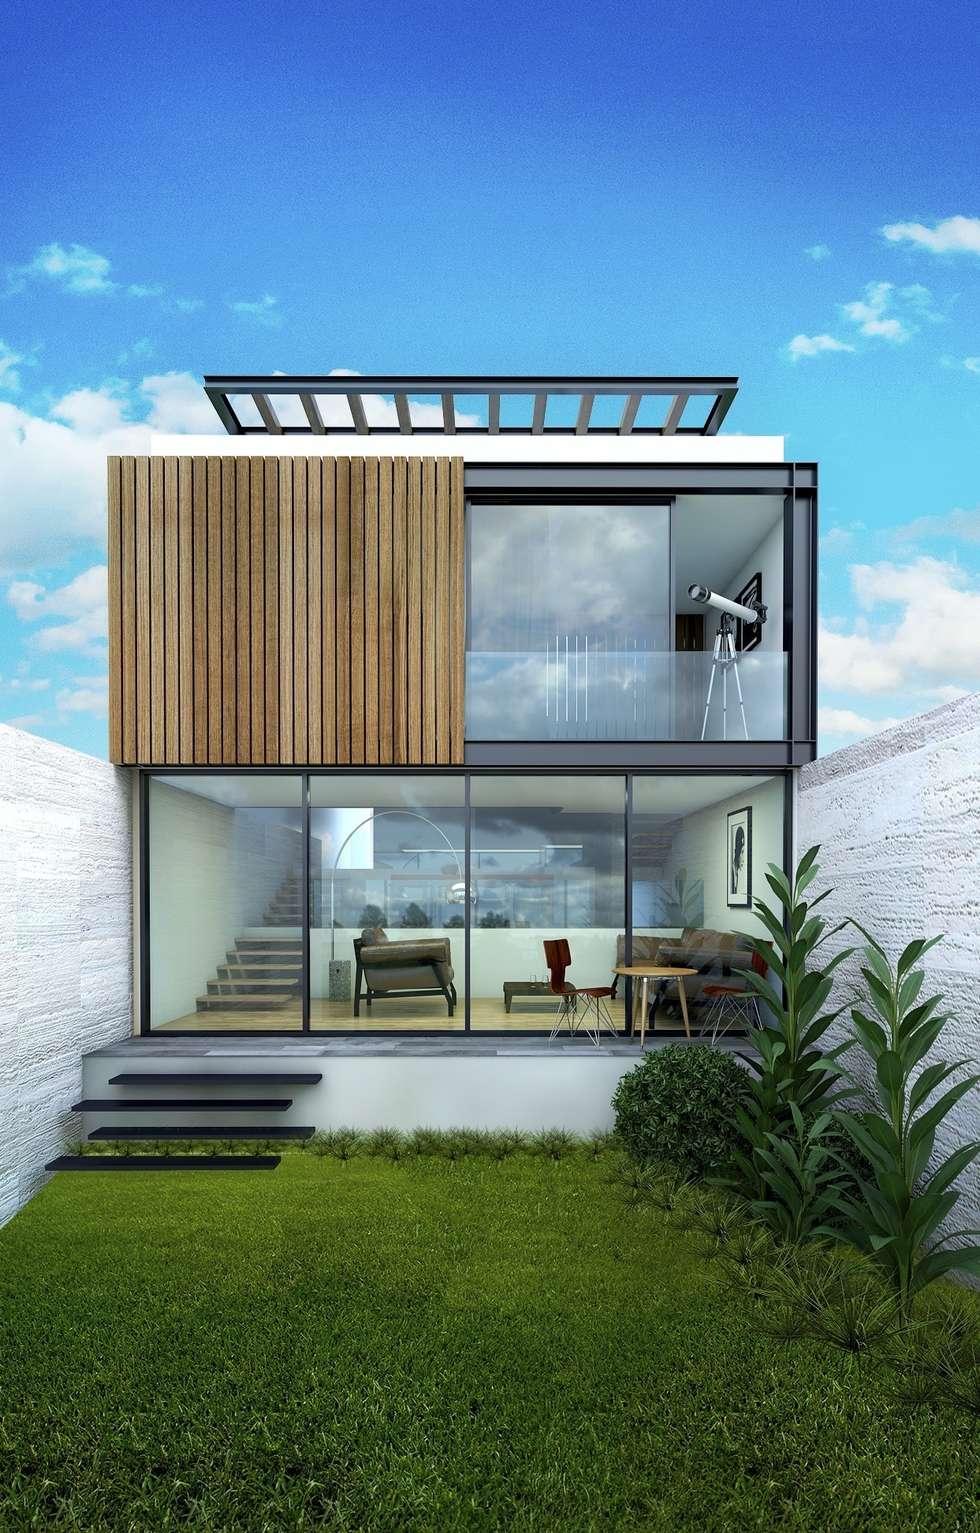 17 diseños de techos que harán lucir tu fachada